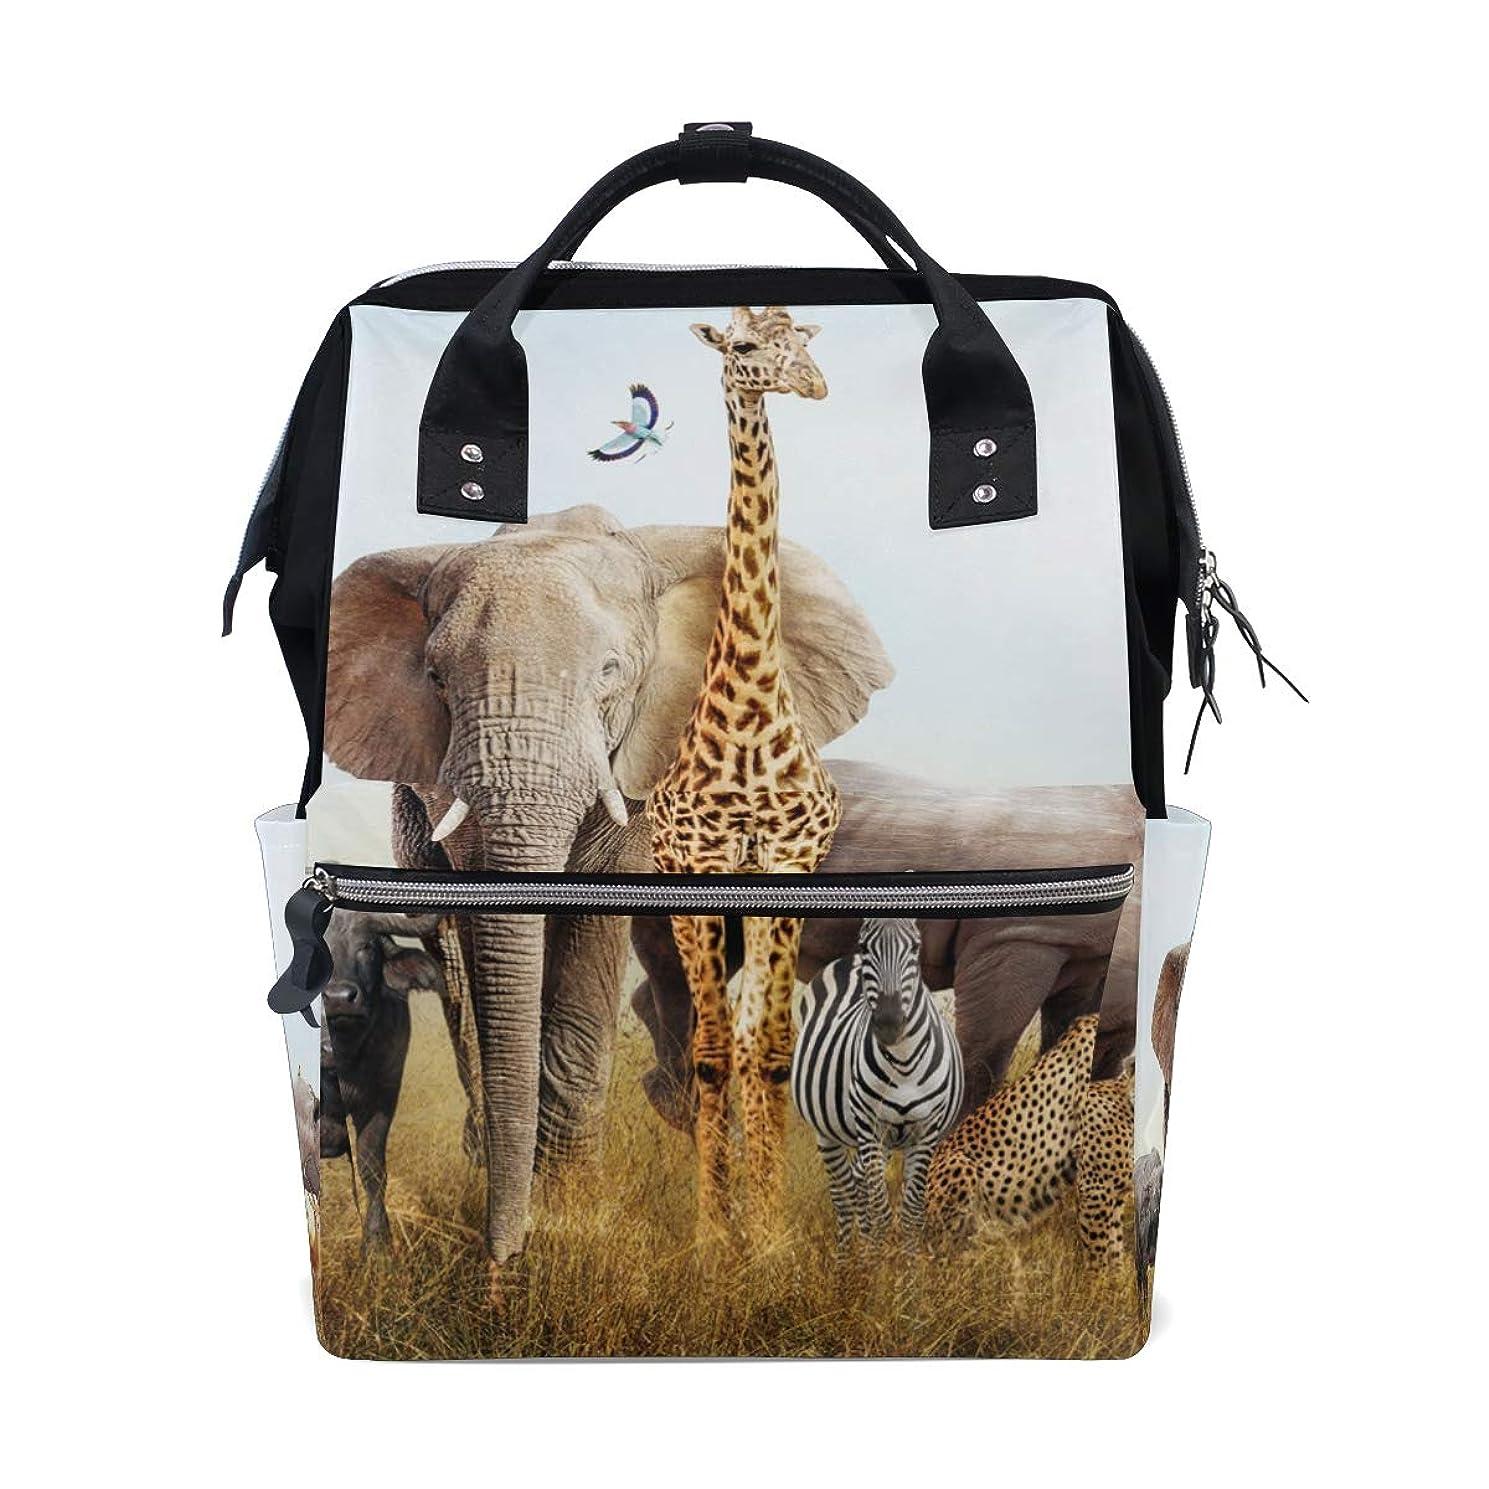 Elephant Giraffe Rhinoceros Lion Leopard School Backpack Large Capacity Mummy Bags Laptop Handbag Casual Travel Rucksack Satchel For Women Men Adult Teen Children